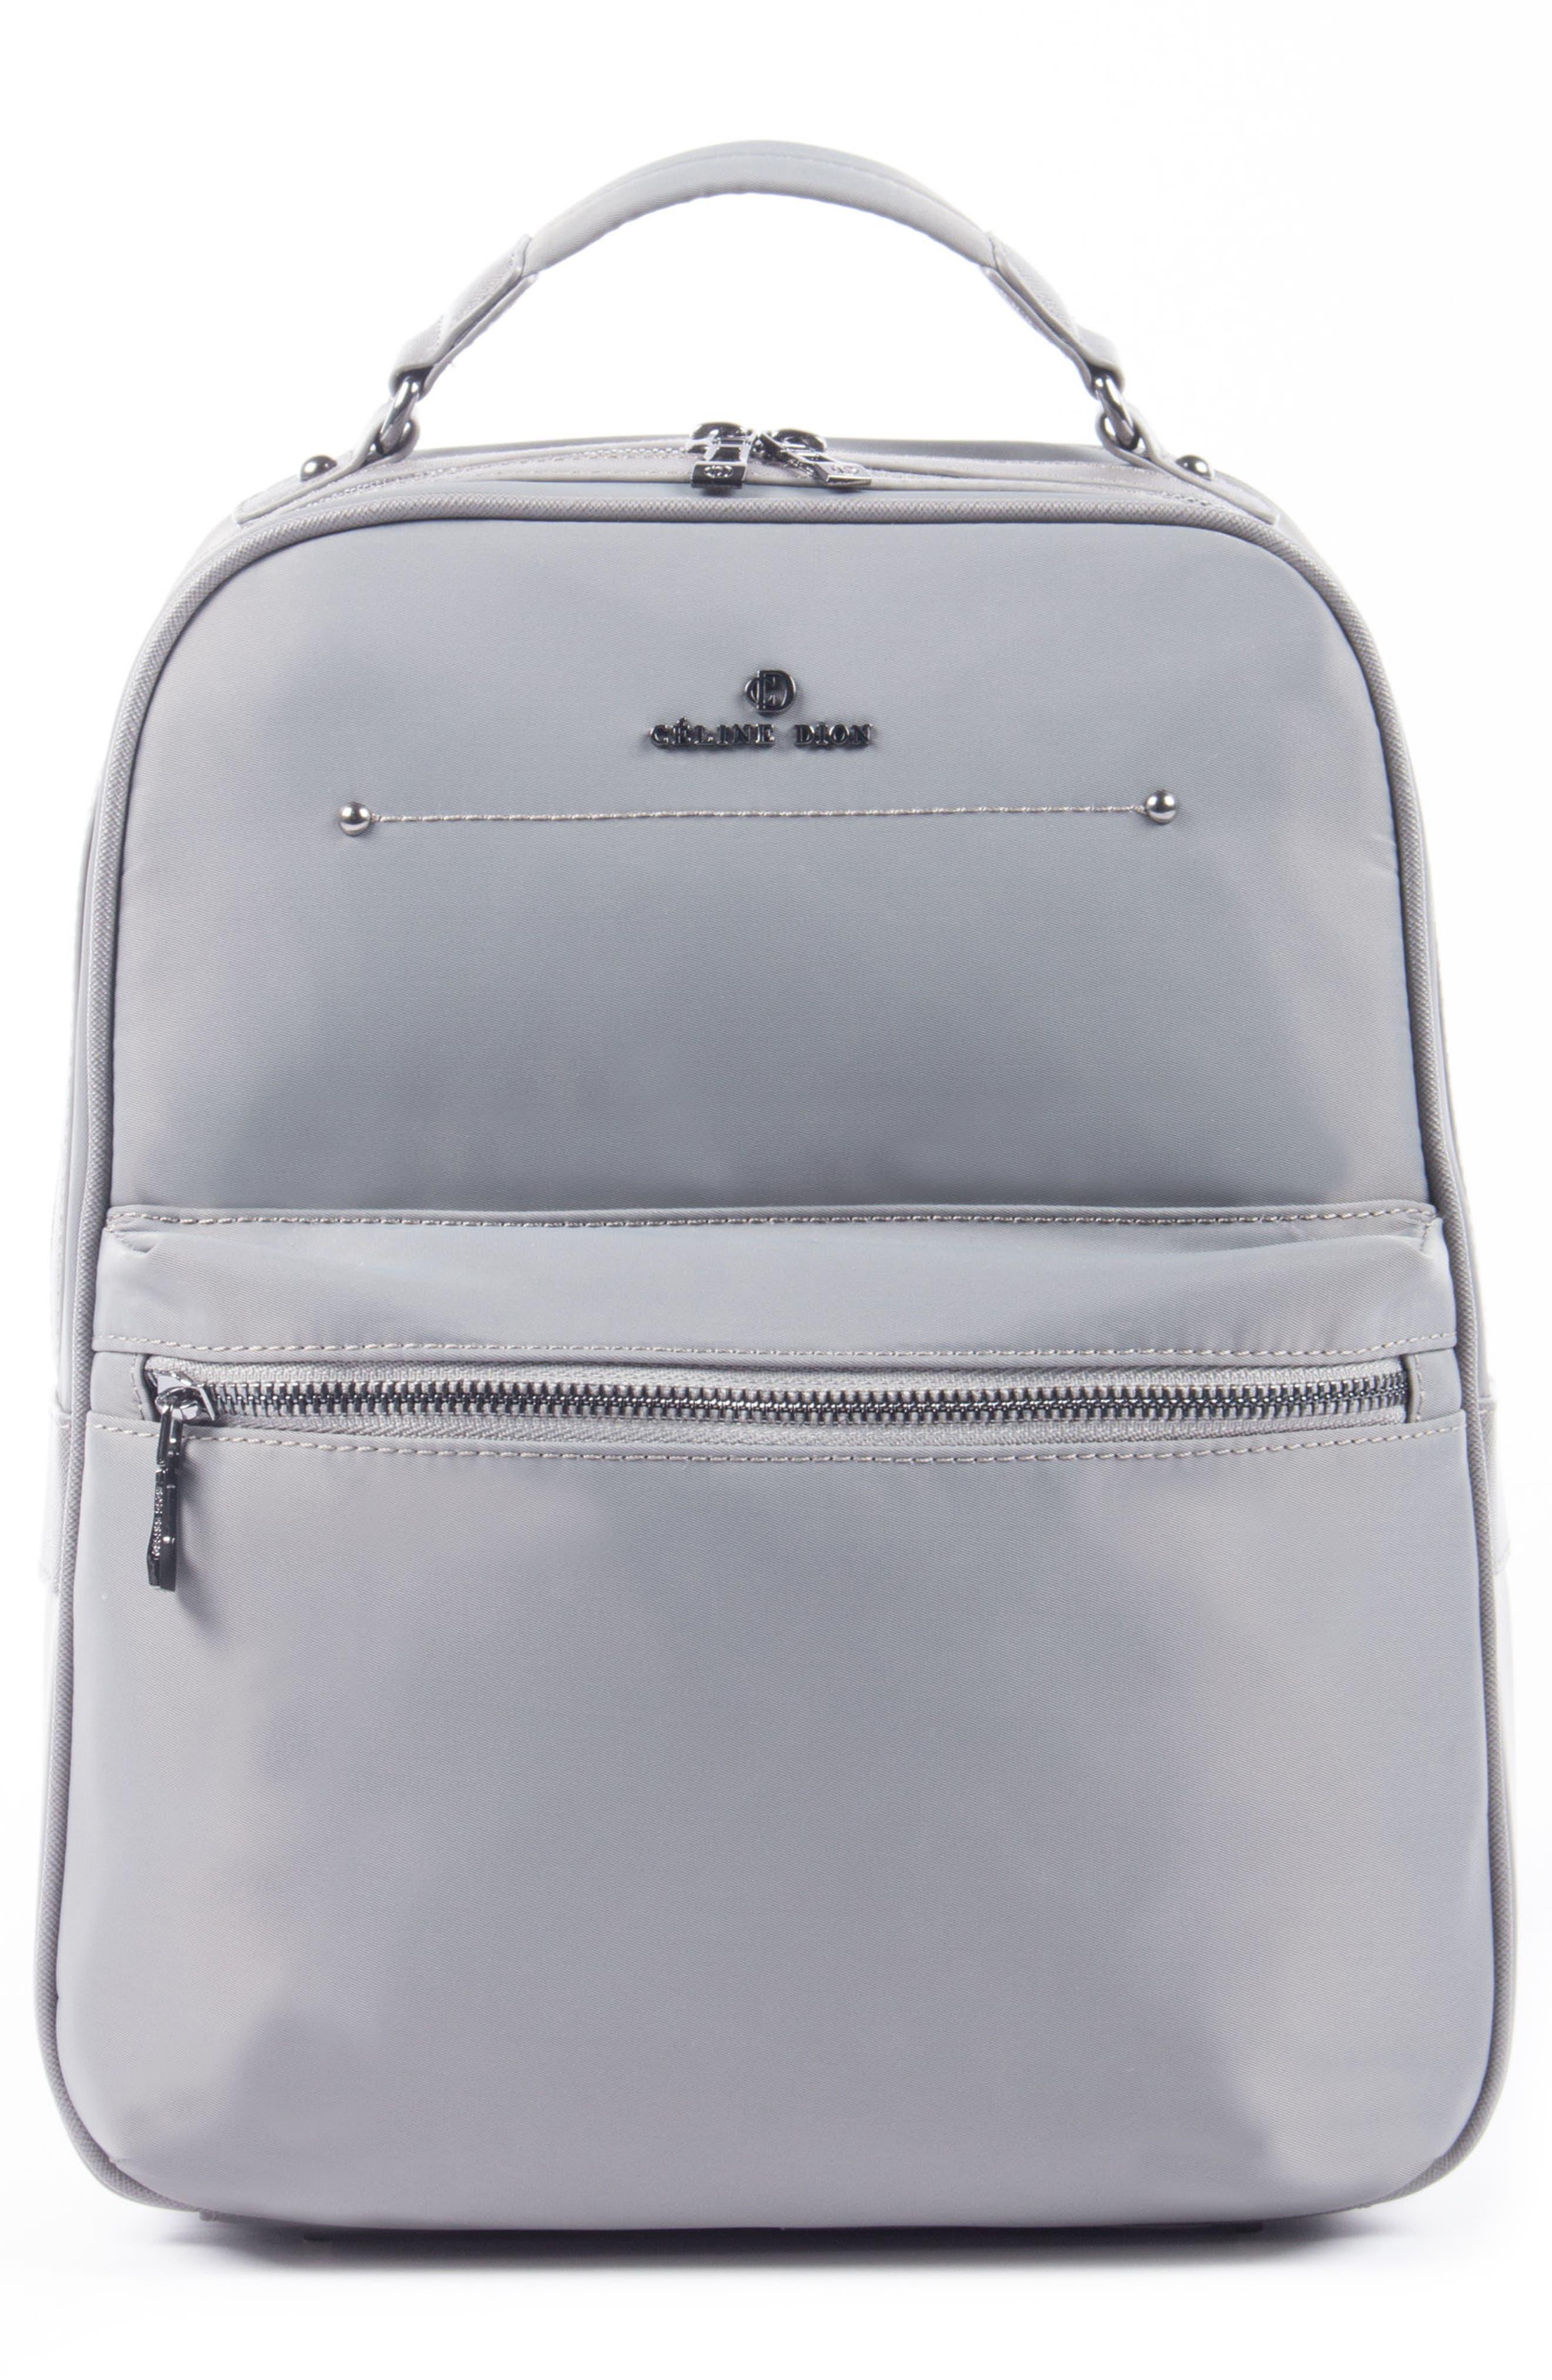 CELINE DION Céline Dion Presto Nylon Backpack